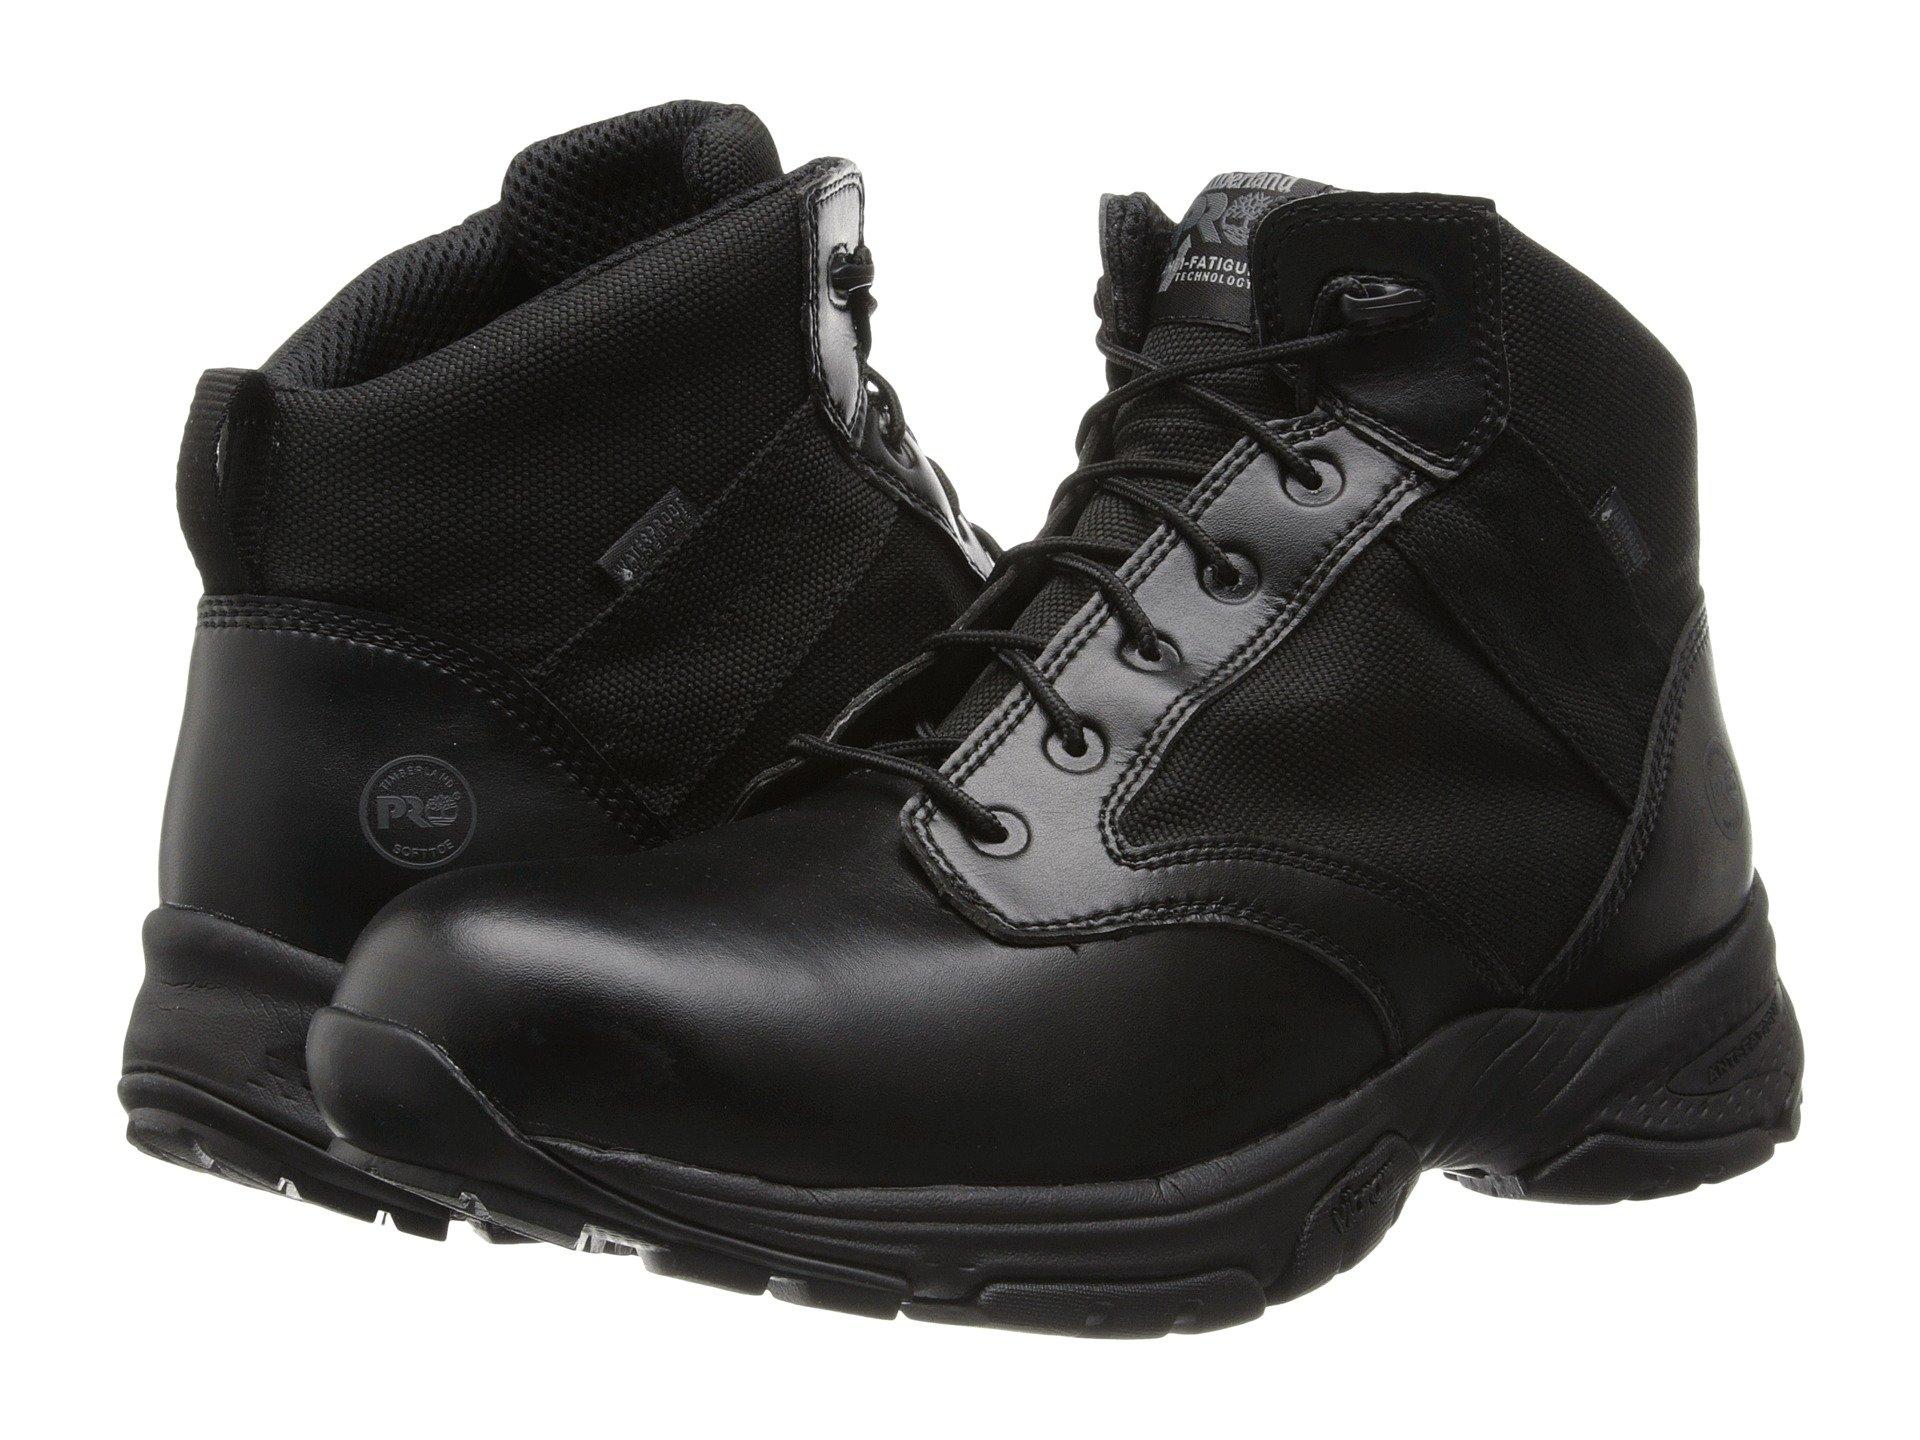 a37b261f4 Black. 282. Timberland PRO. Valor Tactical 5